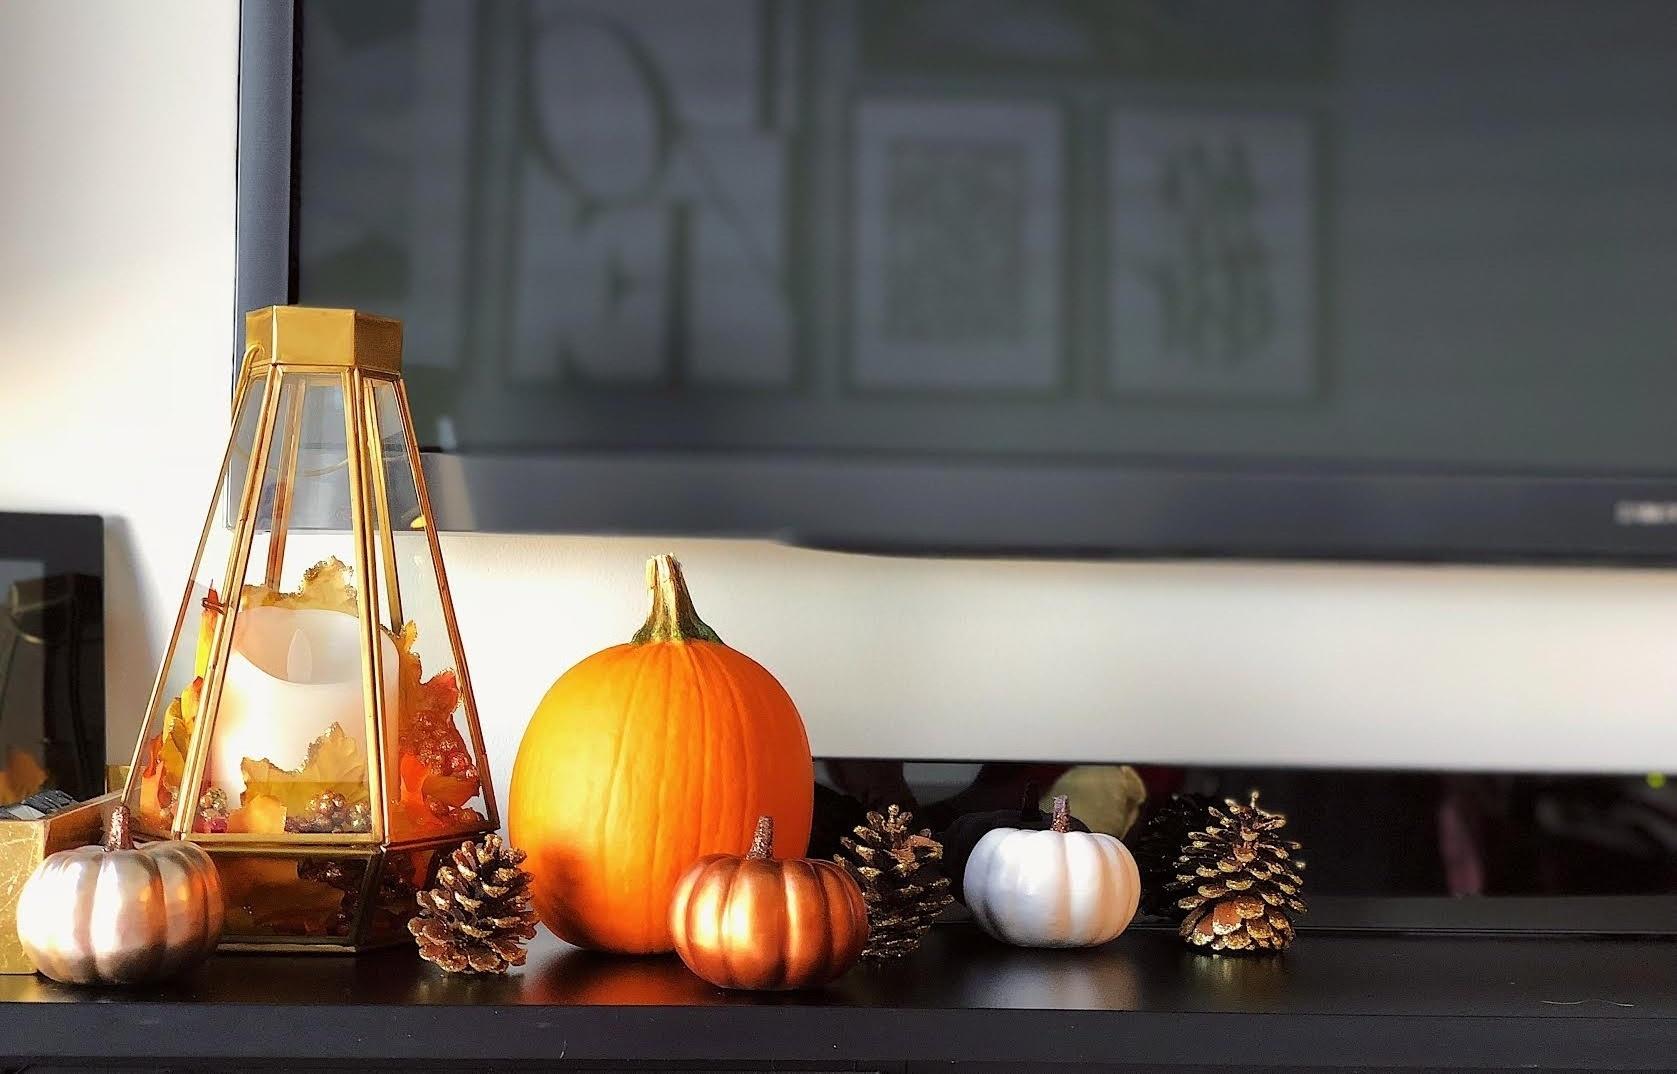 Muslim-home-decor-modern-fall-decorating-ideas-final-028259-edited